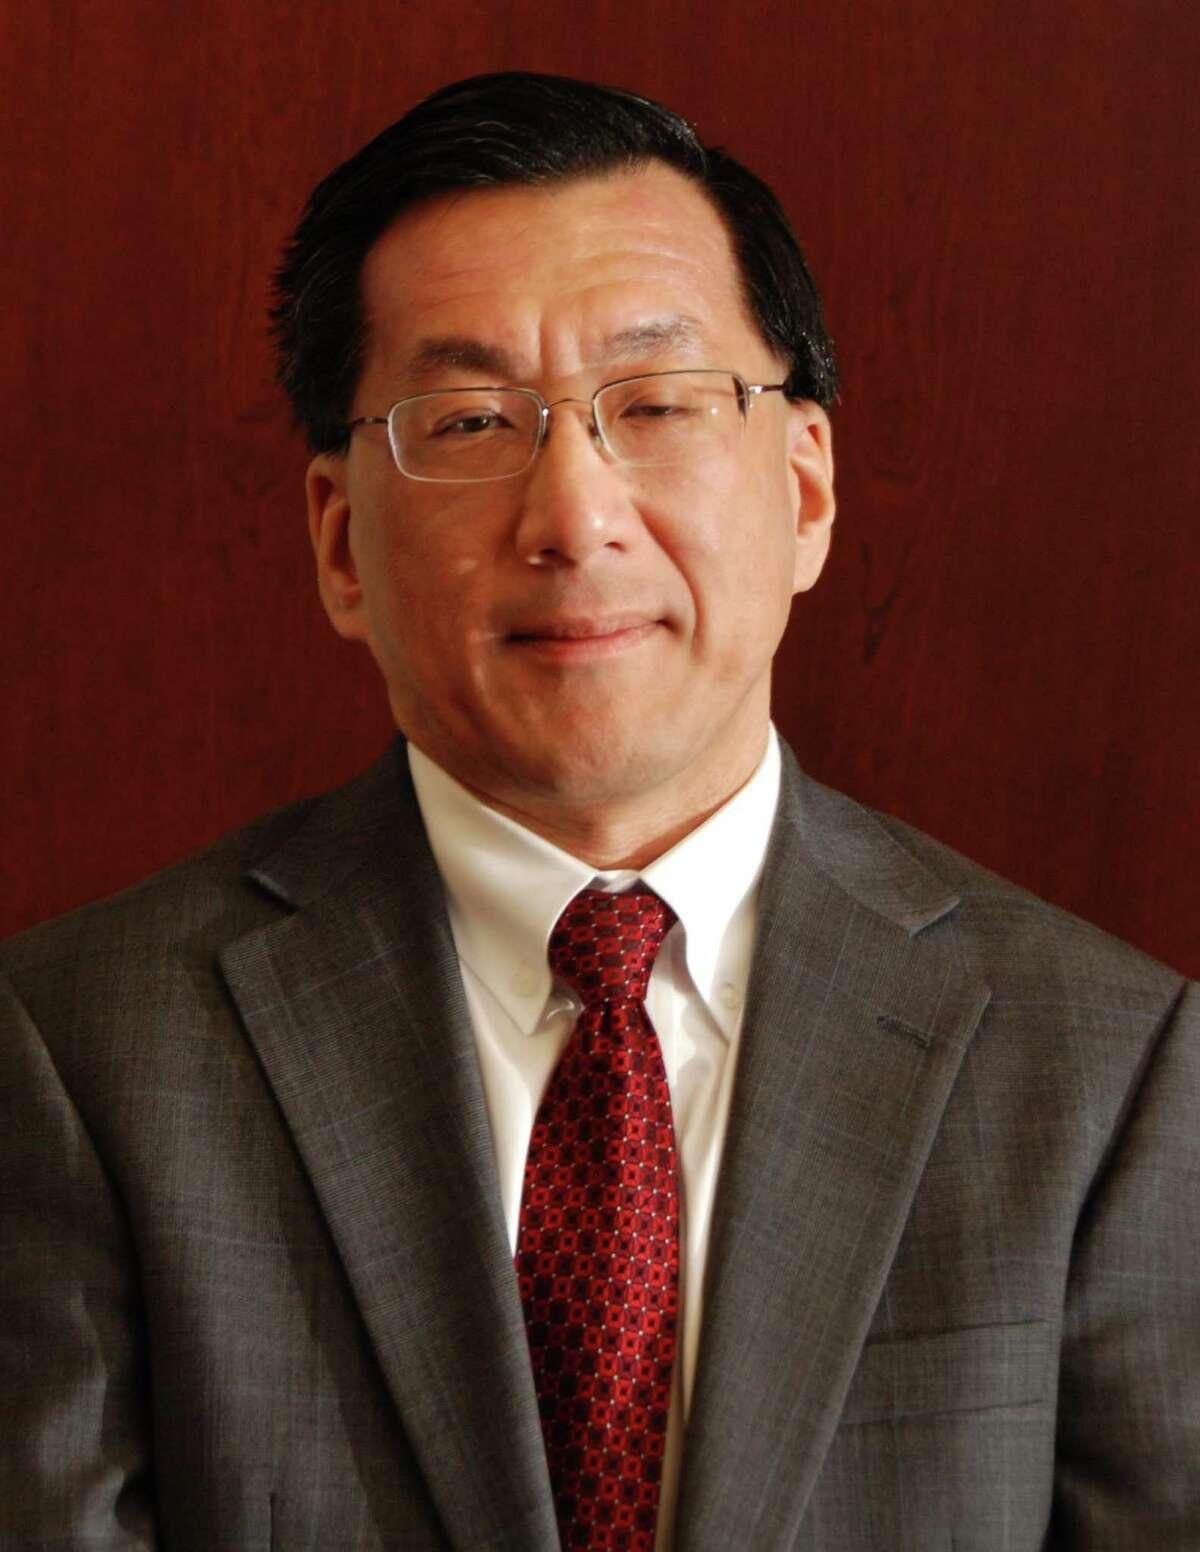 Michael Yao